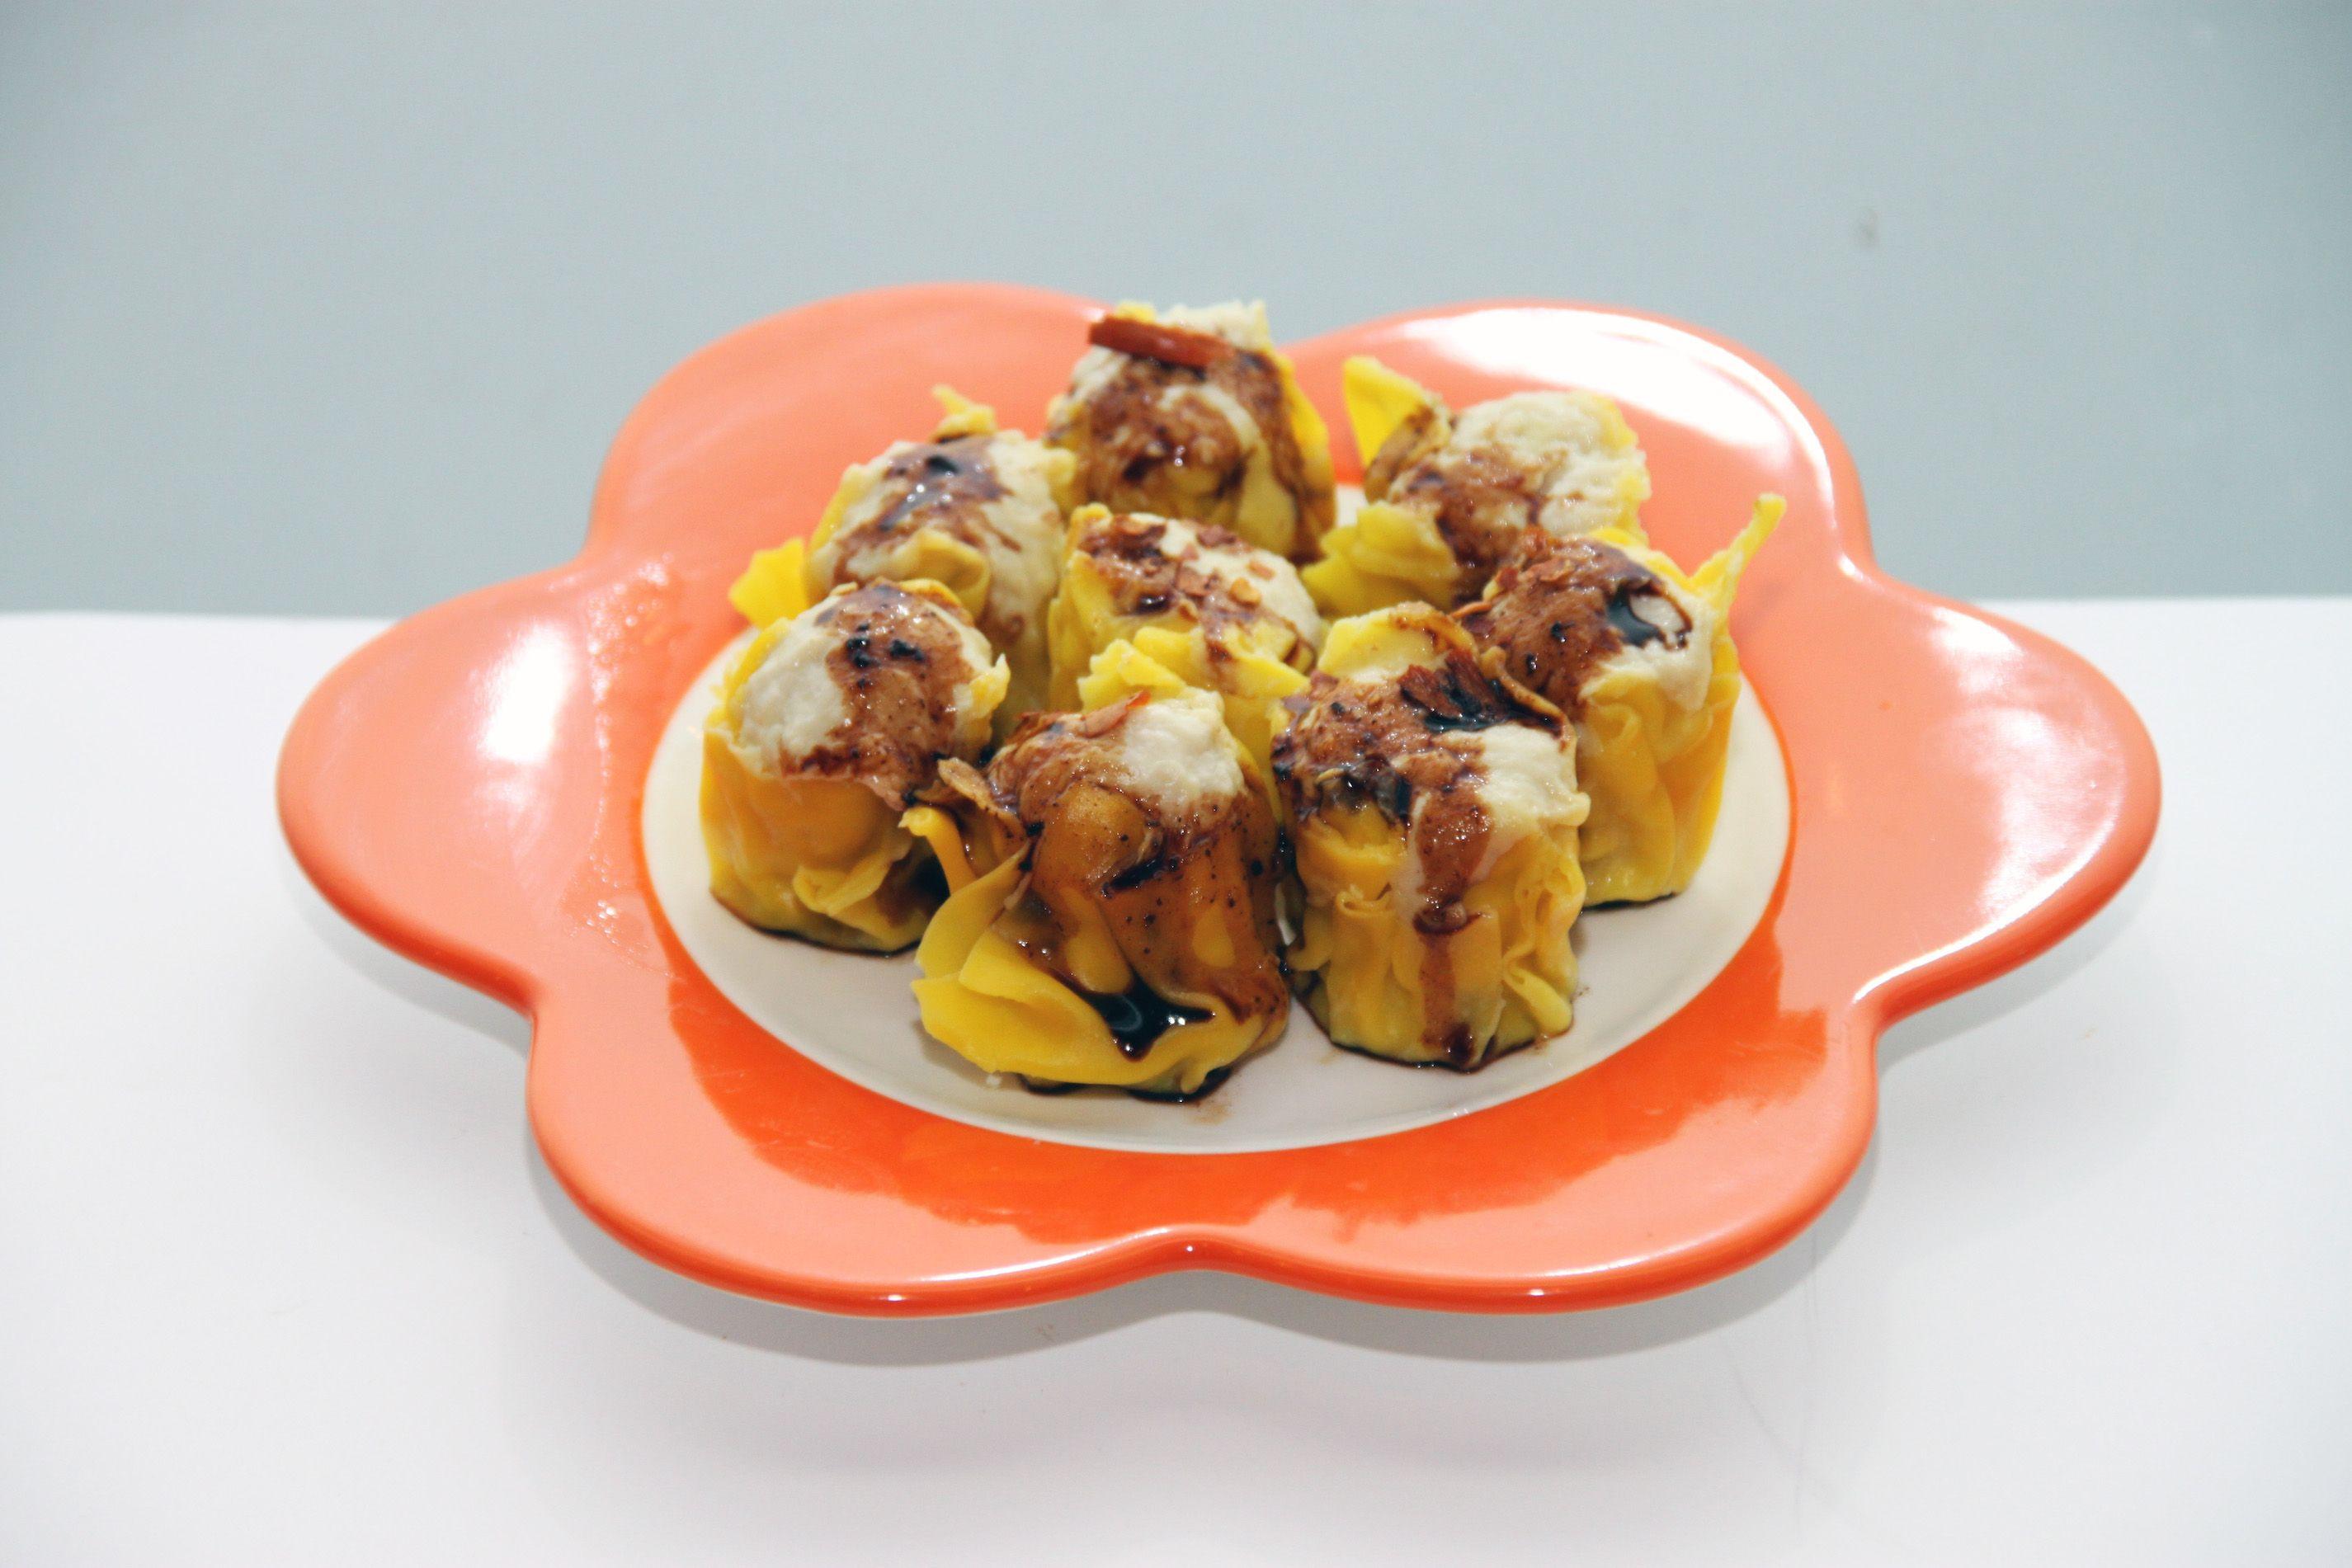 Fish siu mai 魚肉 燒賣 鱼肉 烧卖 food appetizers breakfast